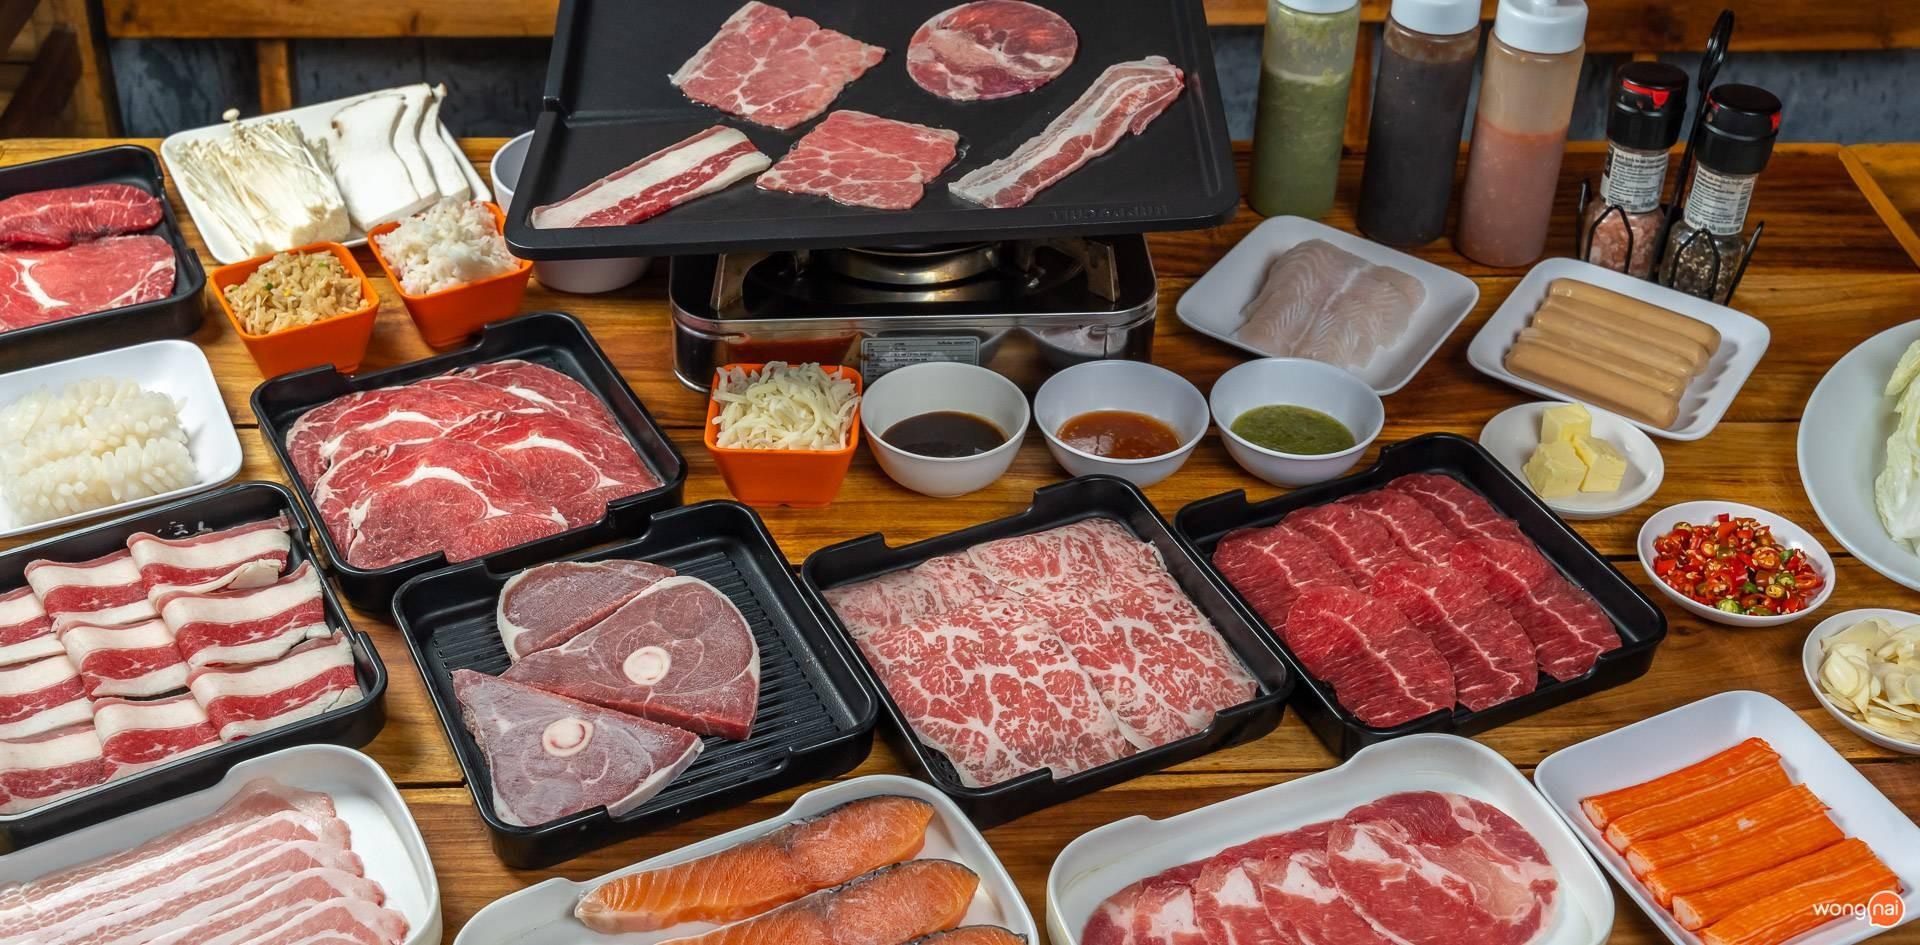 Dragon_buffet เนื้อย่างในตำนานปรีดี46ฯ ปรีดีพนมยงค์ 46